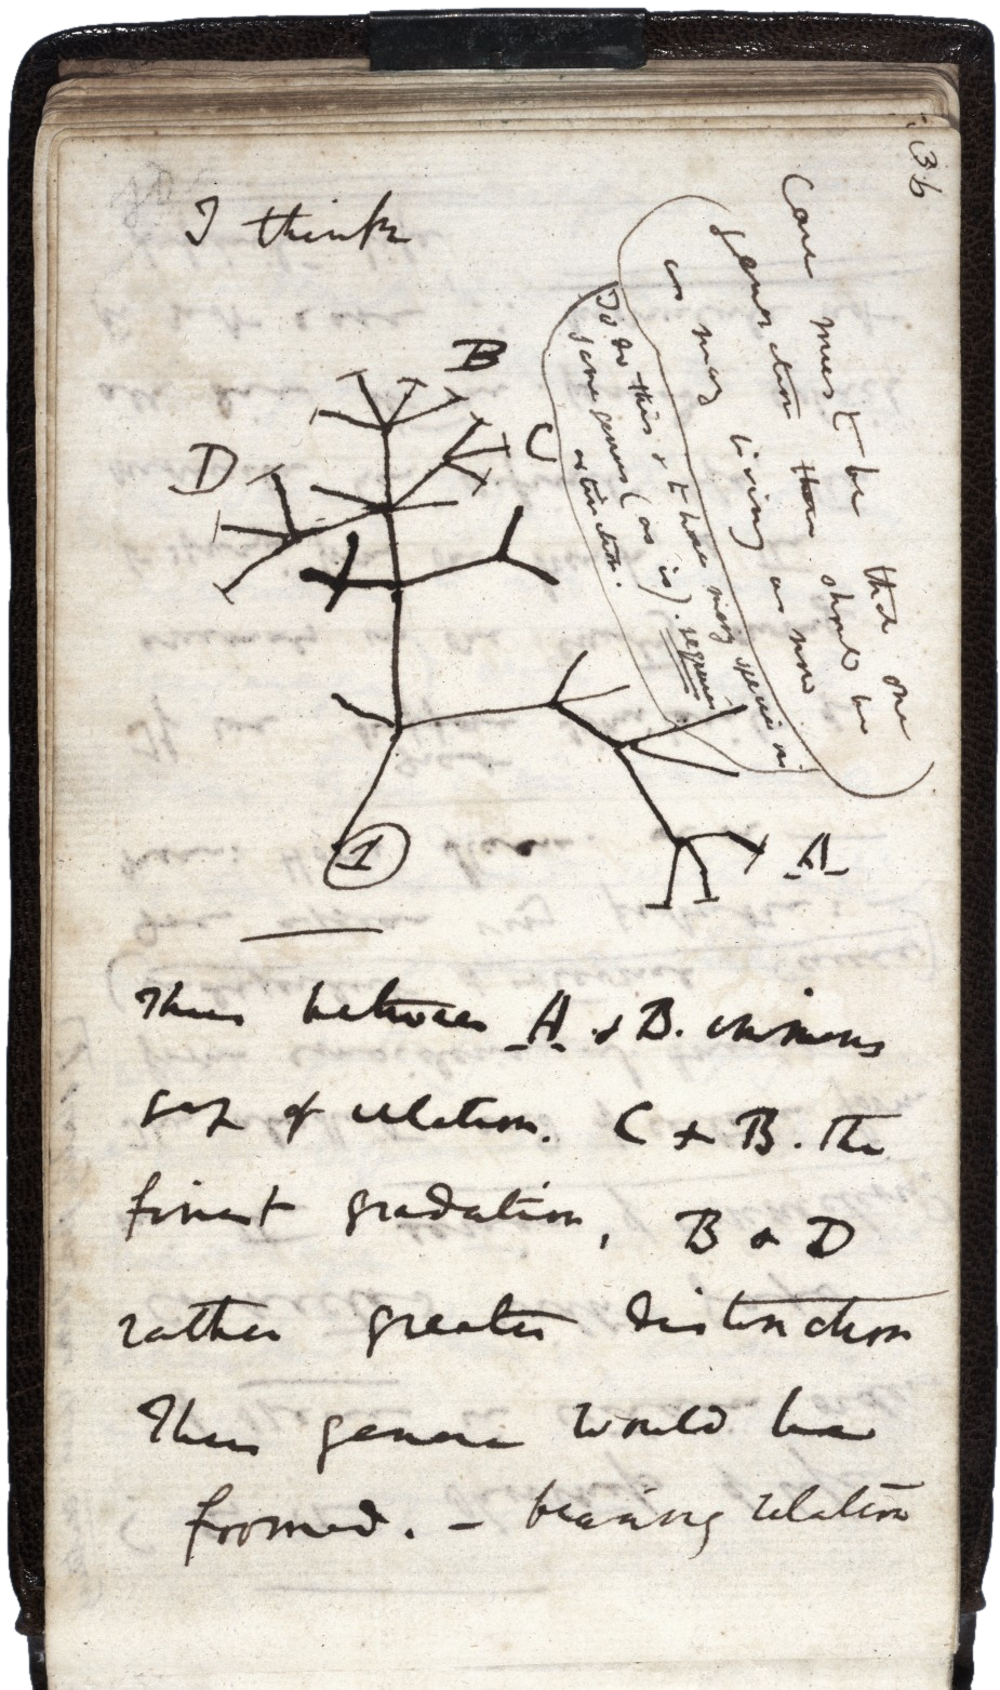 Charles Darwin's first diagram